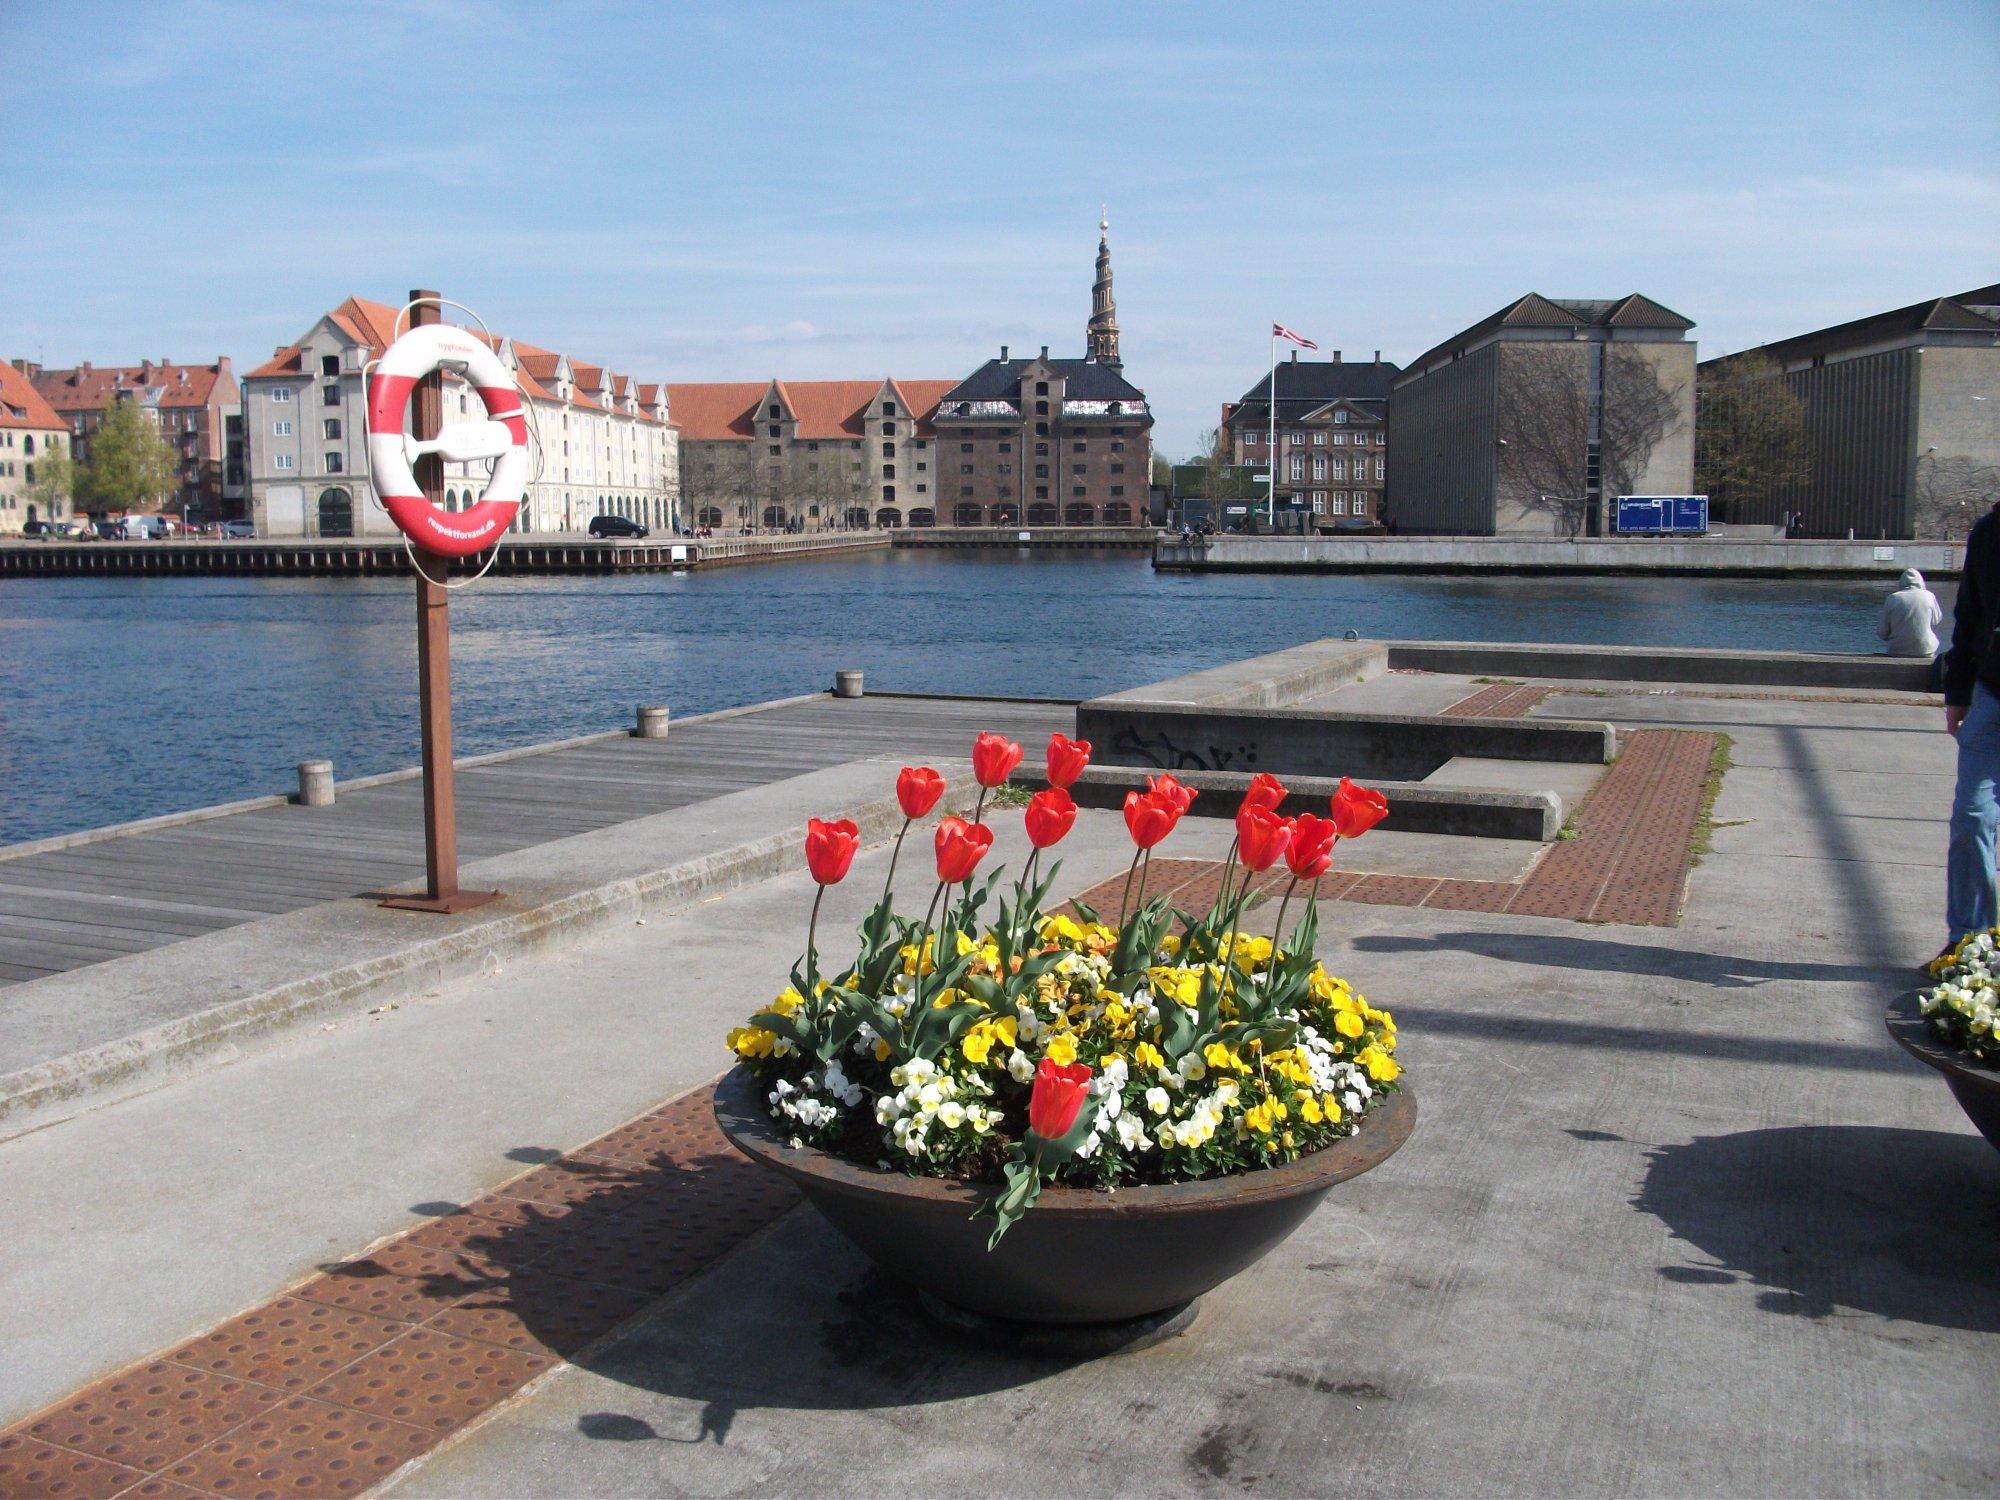 Waterfront, Our Saviour's Church